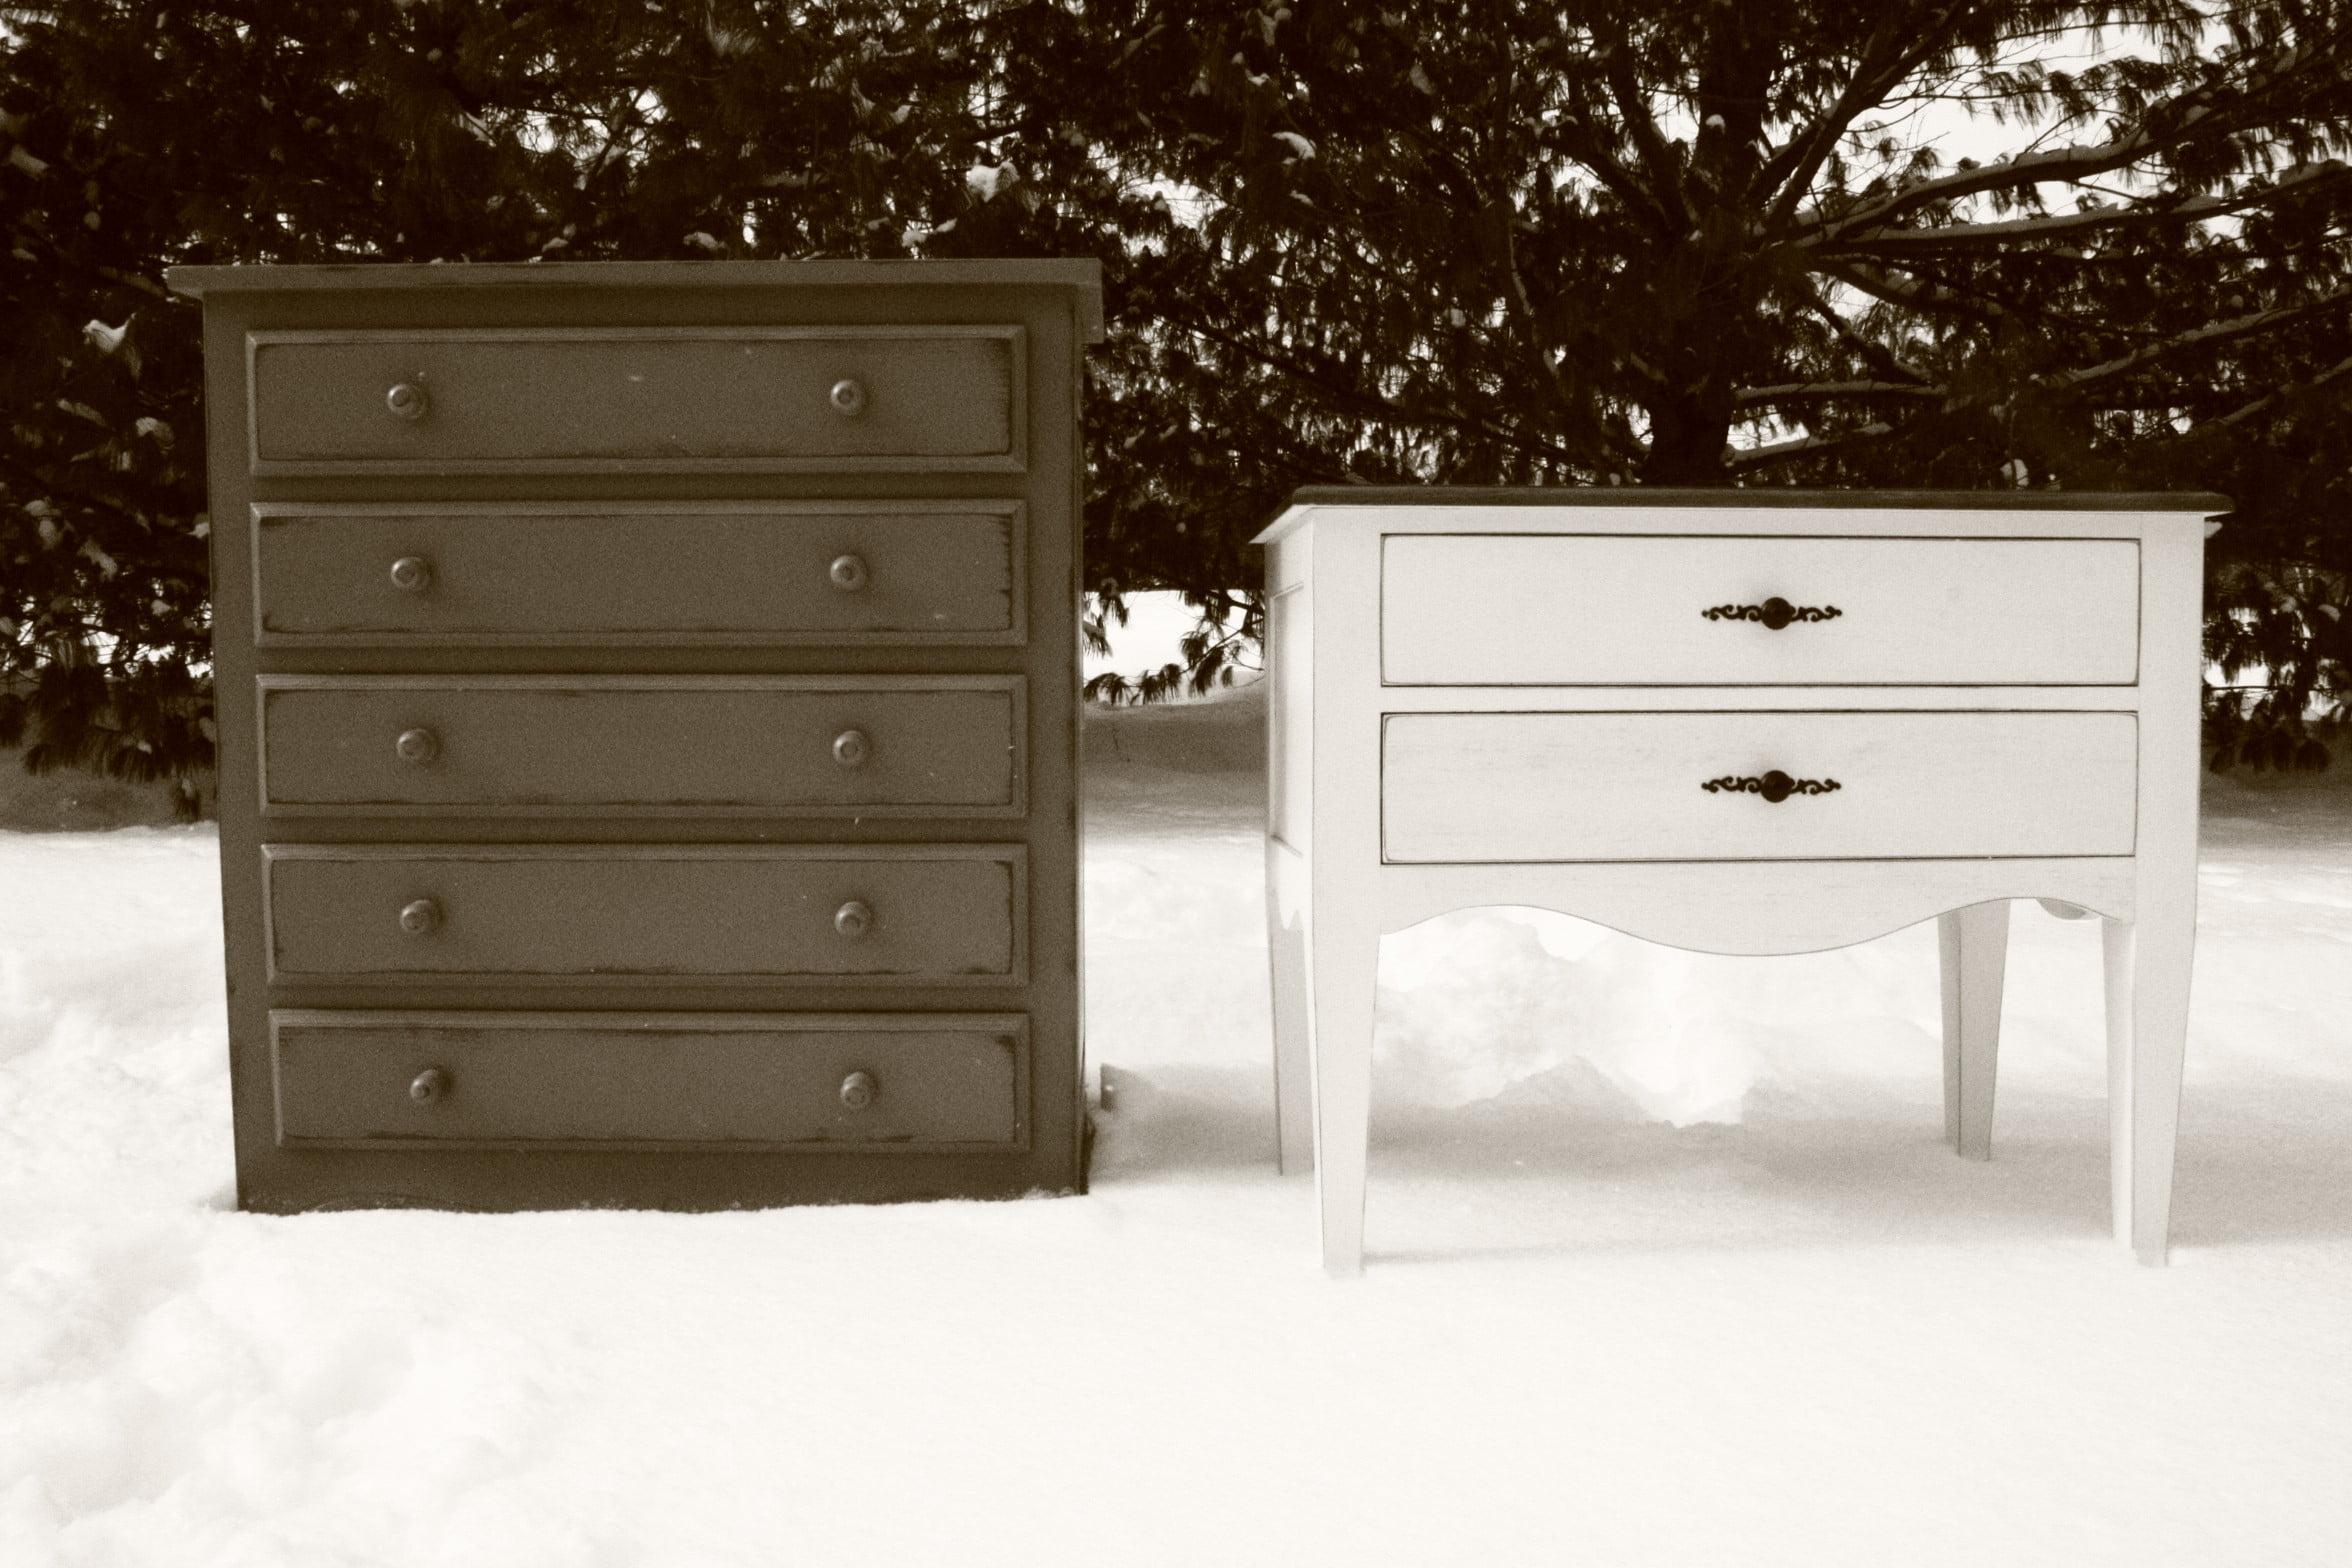 Img 7776 meubles sur mesure meubles hochelaga for Meuble hochelaga montreal